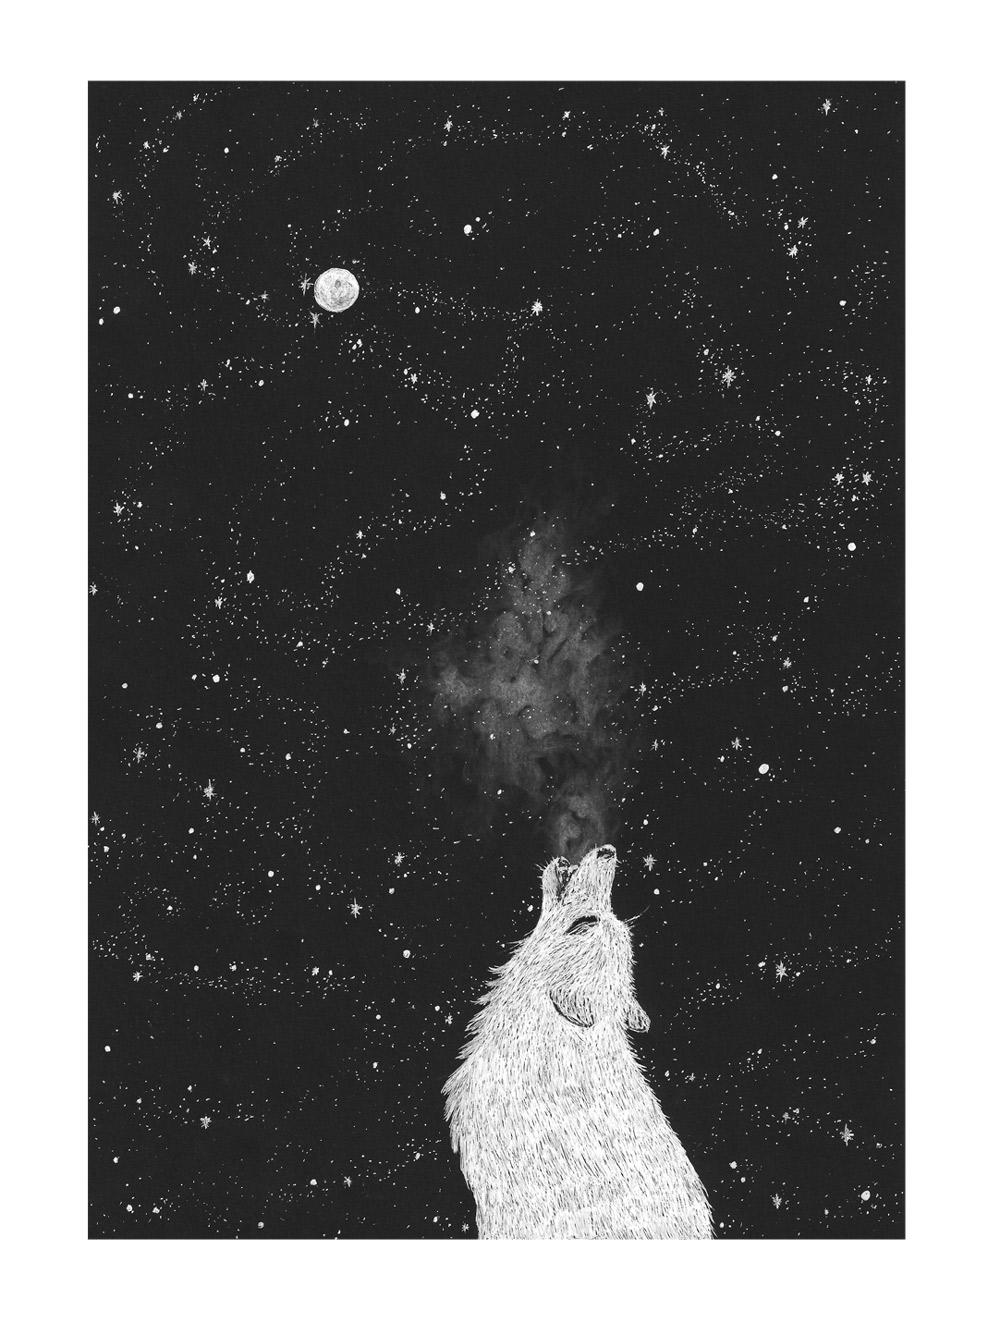 lonesomewolf_1000px 15.24.26.jpg